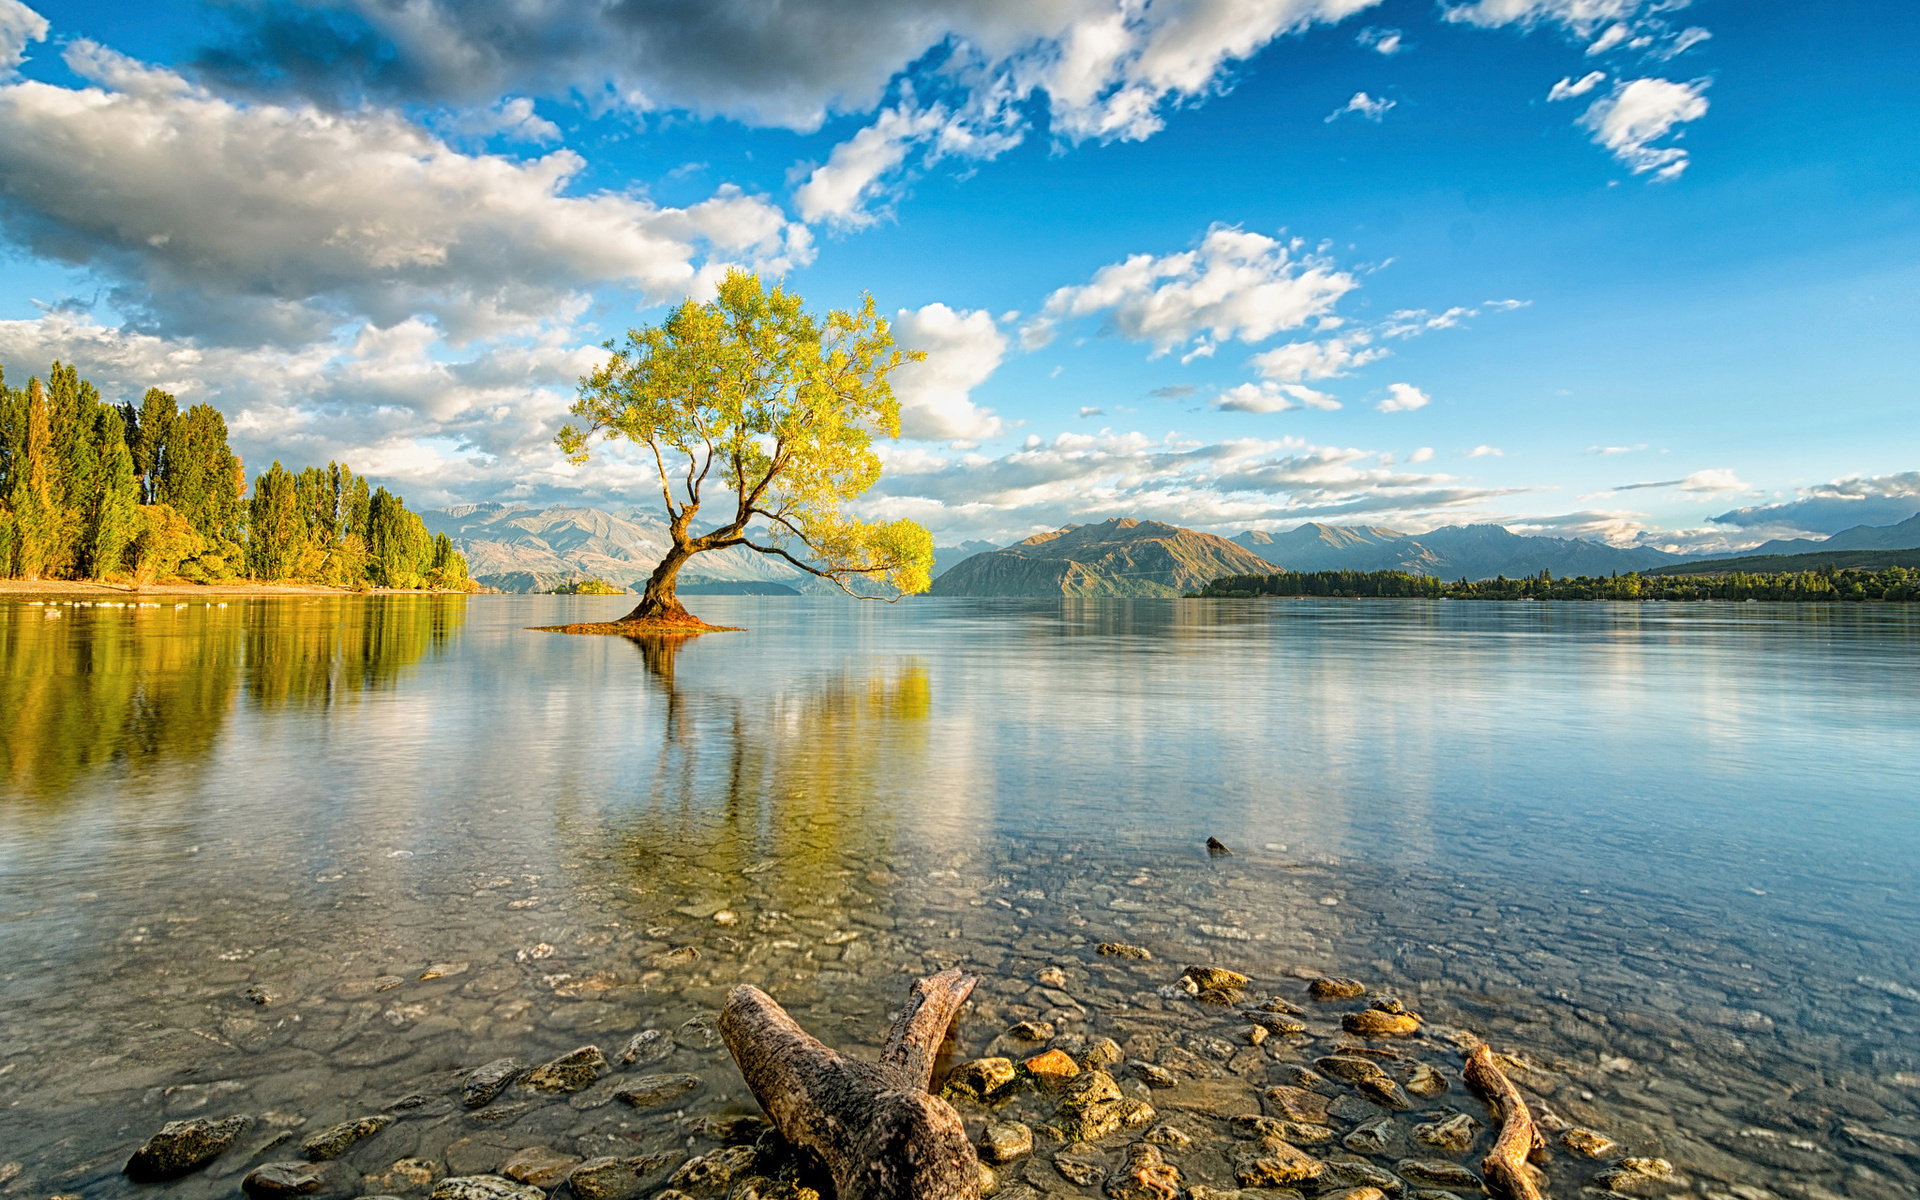 Relaxing hammock on the beautiful blue water